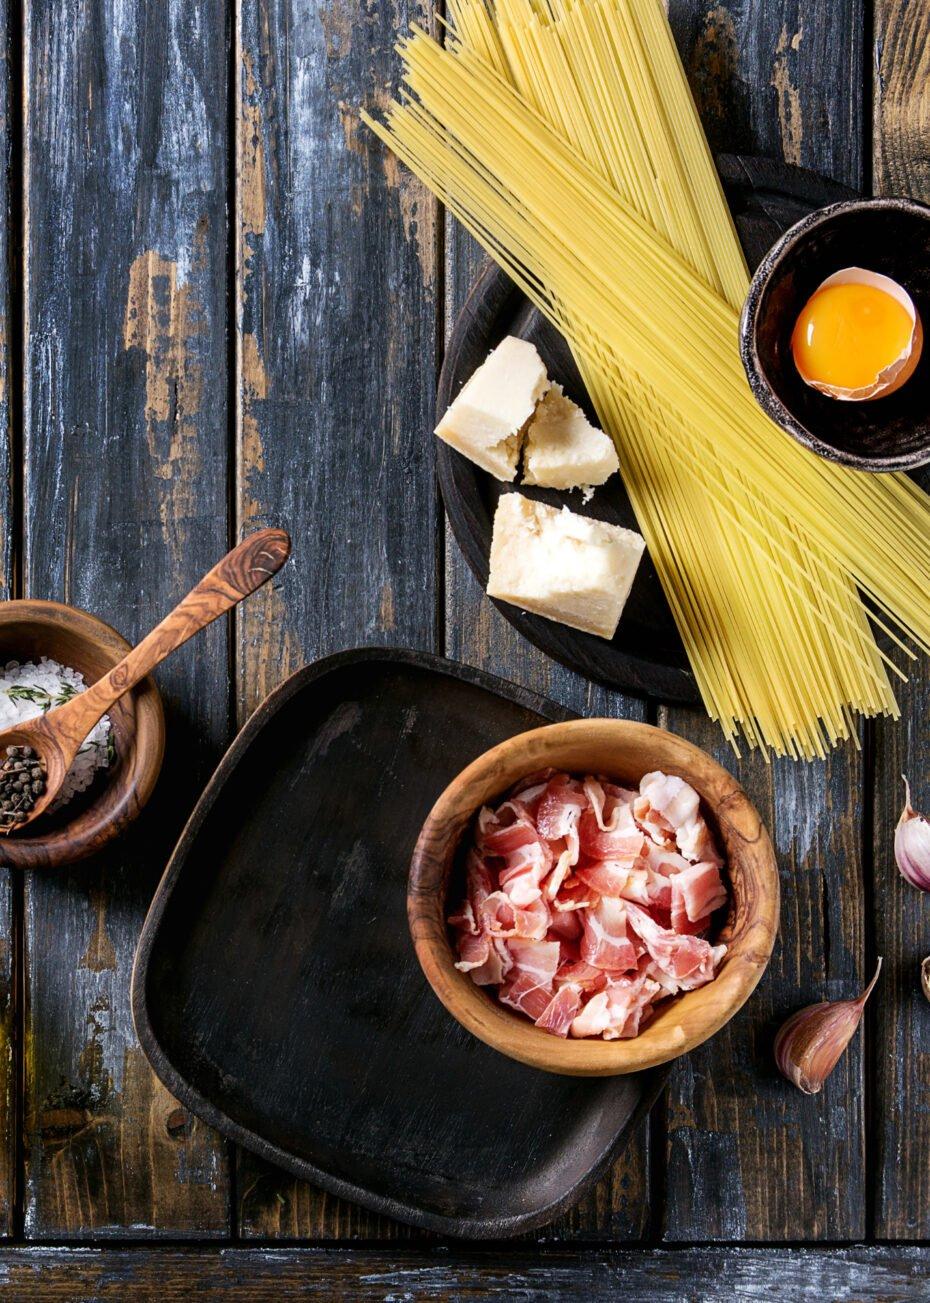 Classic Italian Spaghetti Carbonara, ingredients